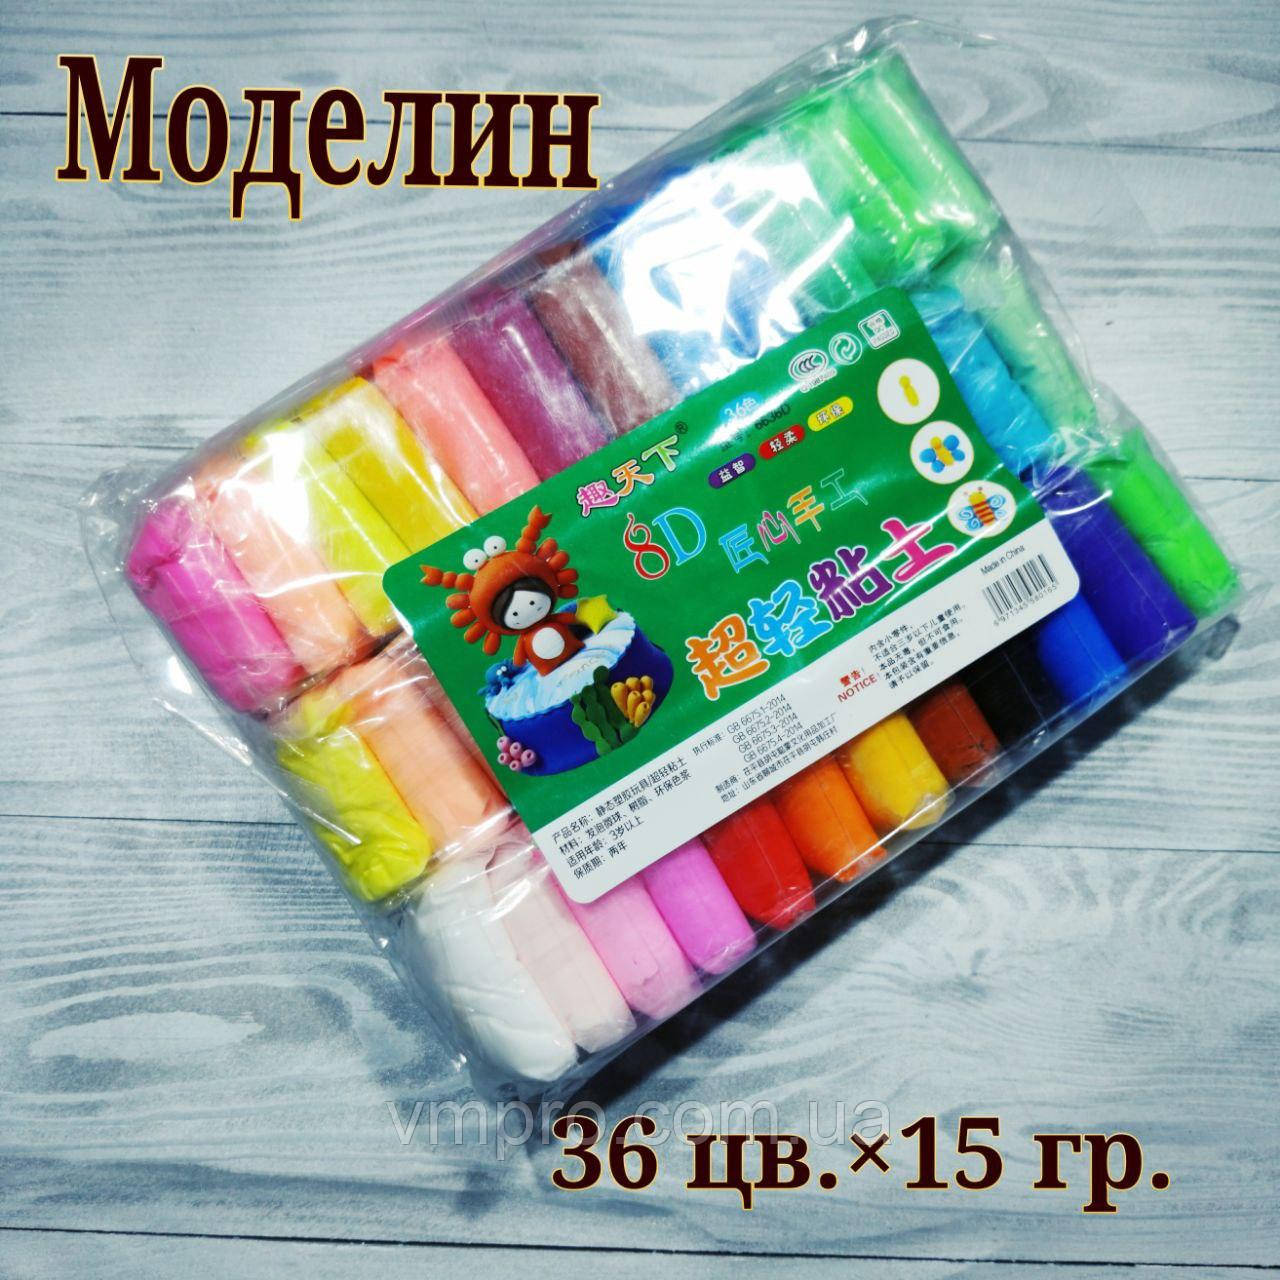 Моделин засыхающий (тесто для лепки),легкий пластилин по15 грамм/пакетик, 36 цветов+3 стека